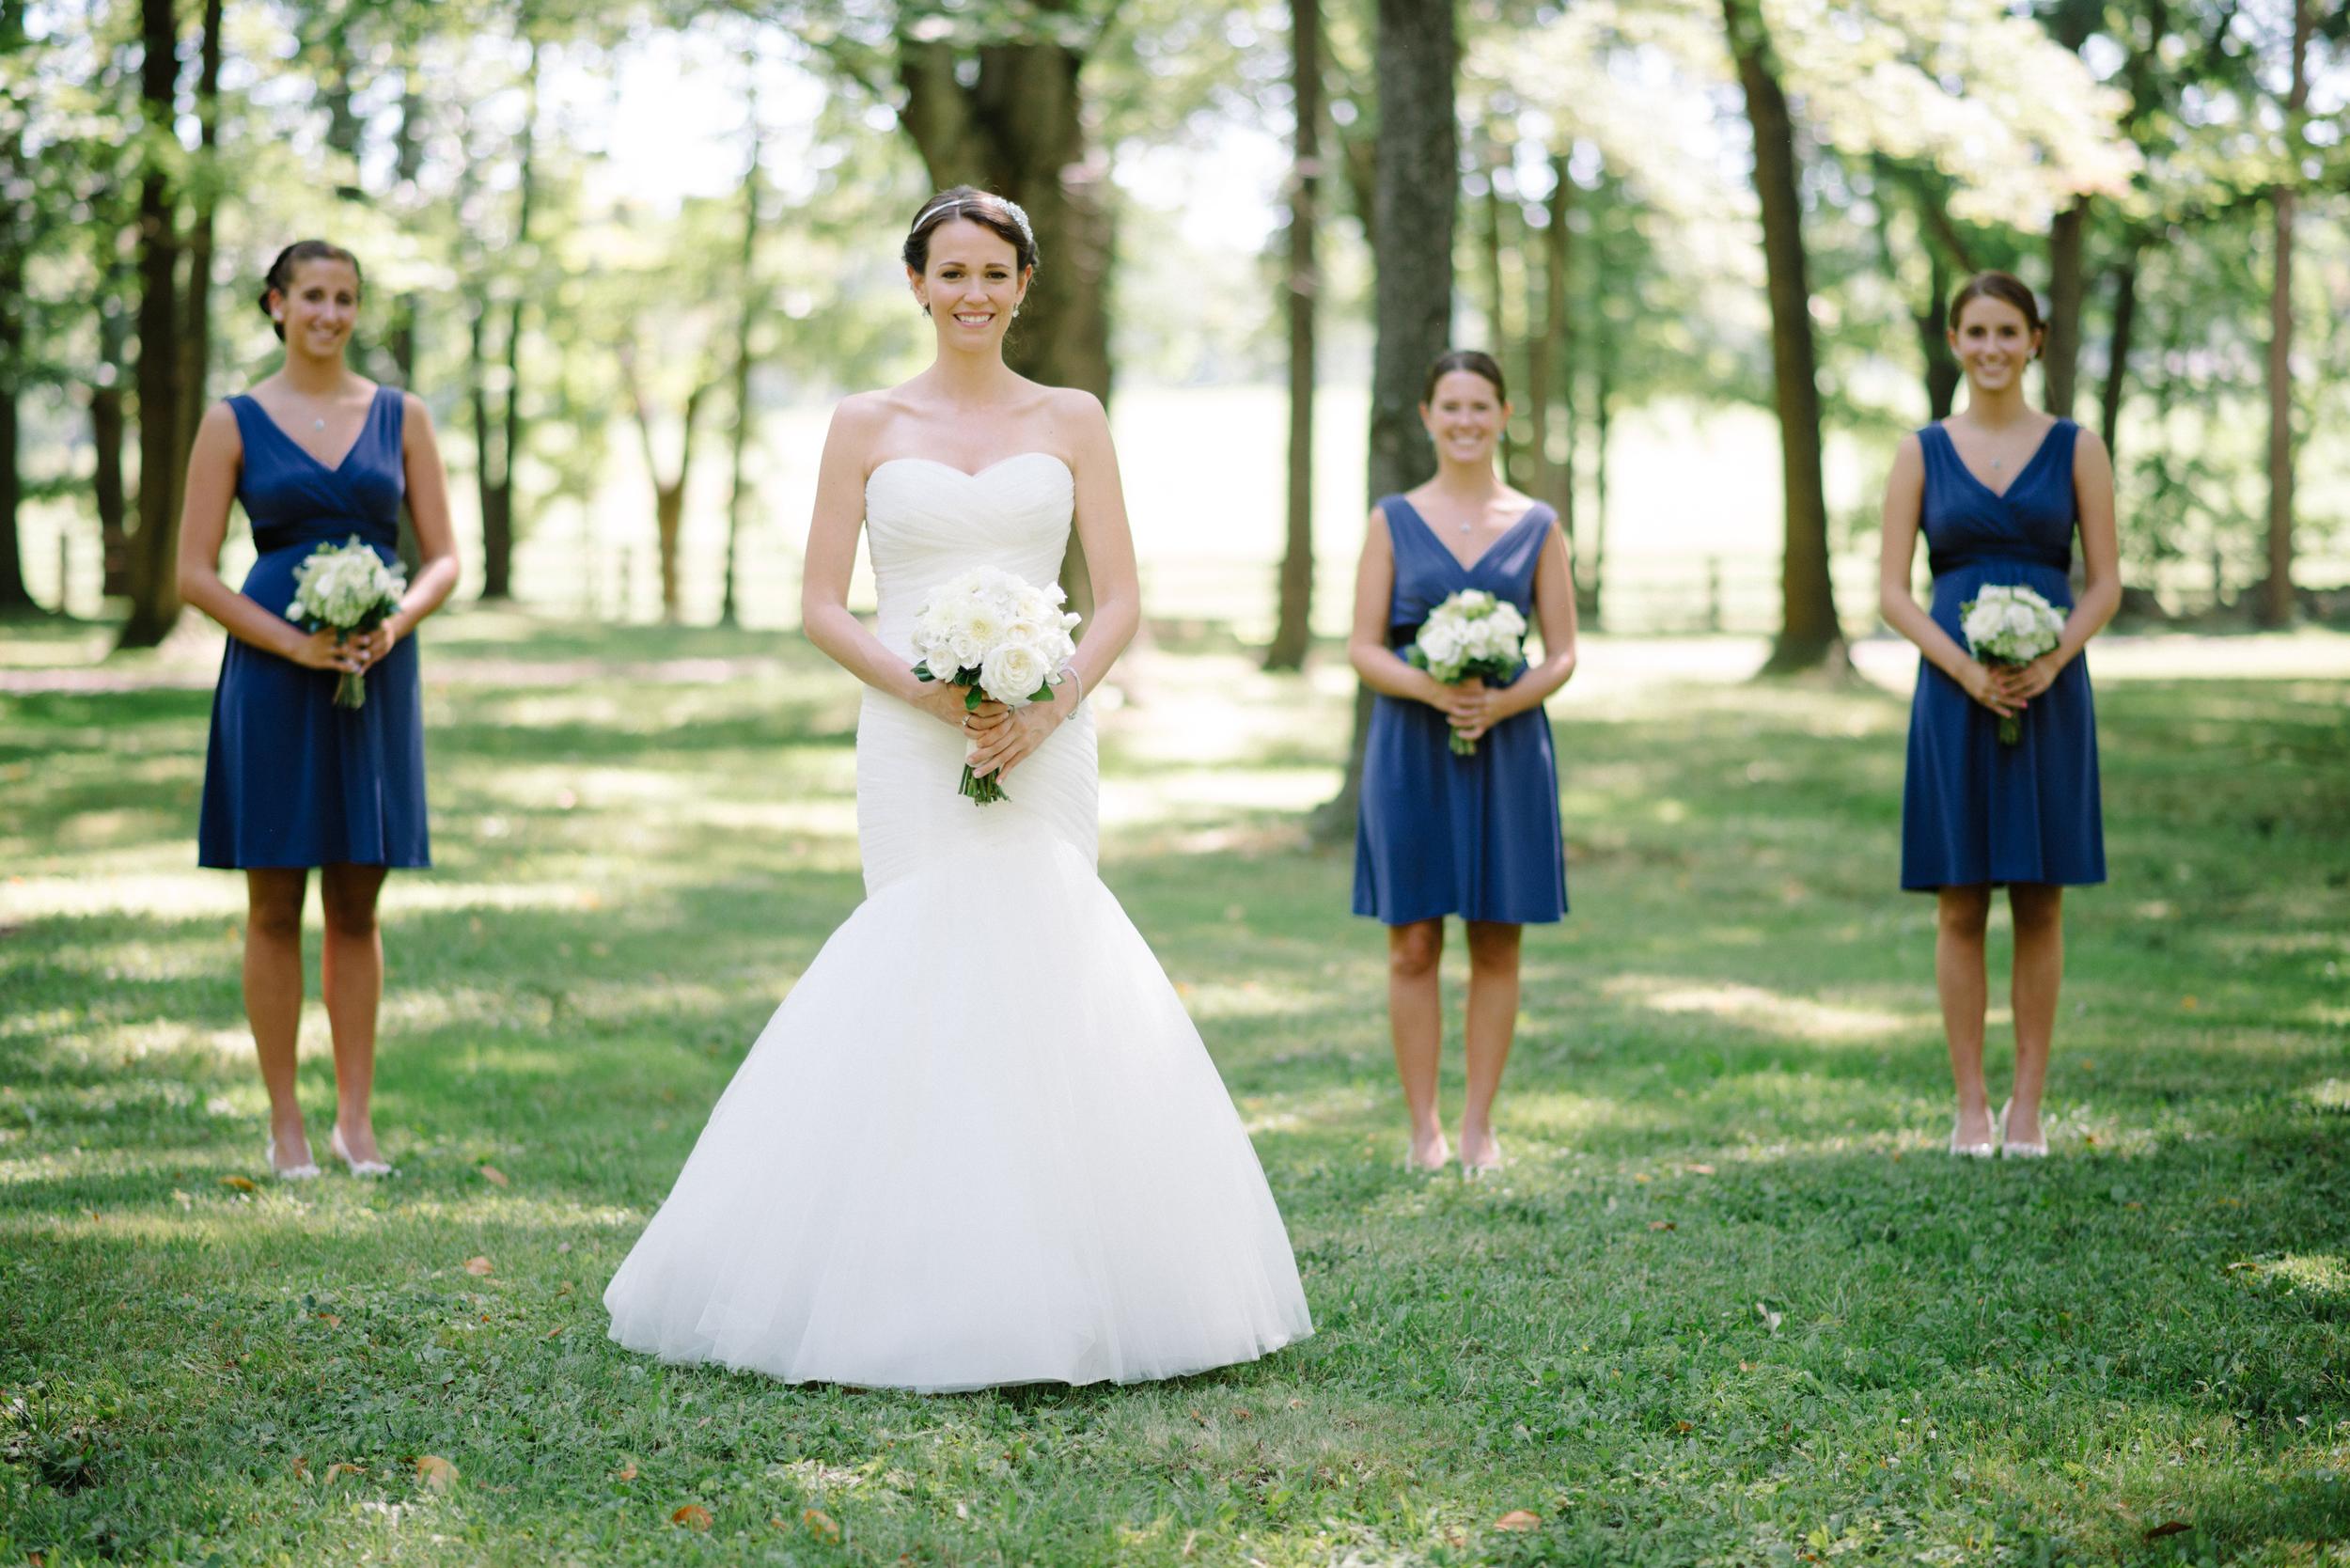 Matt_Swetel_Photography_Erin_and_Jeff_married025.jpg